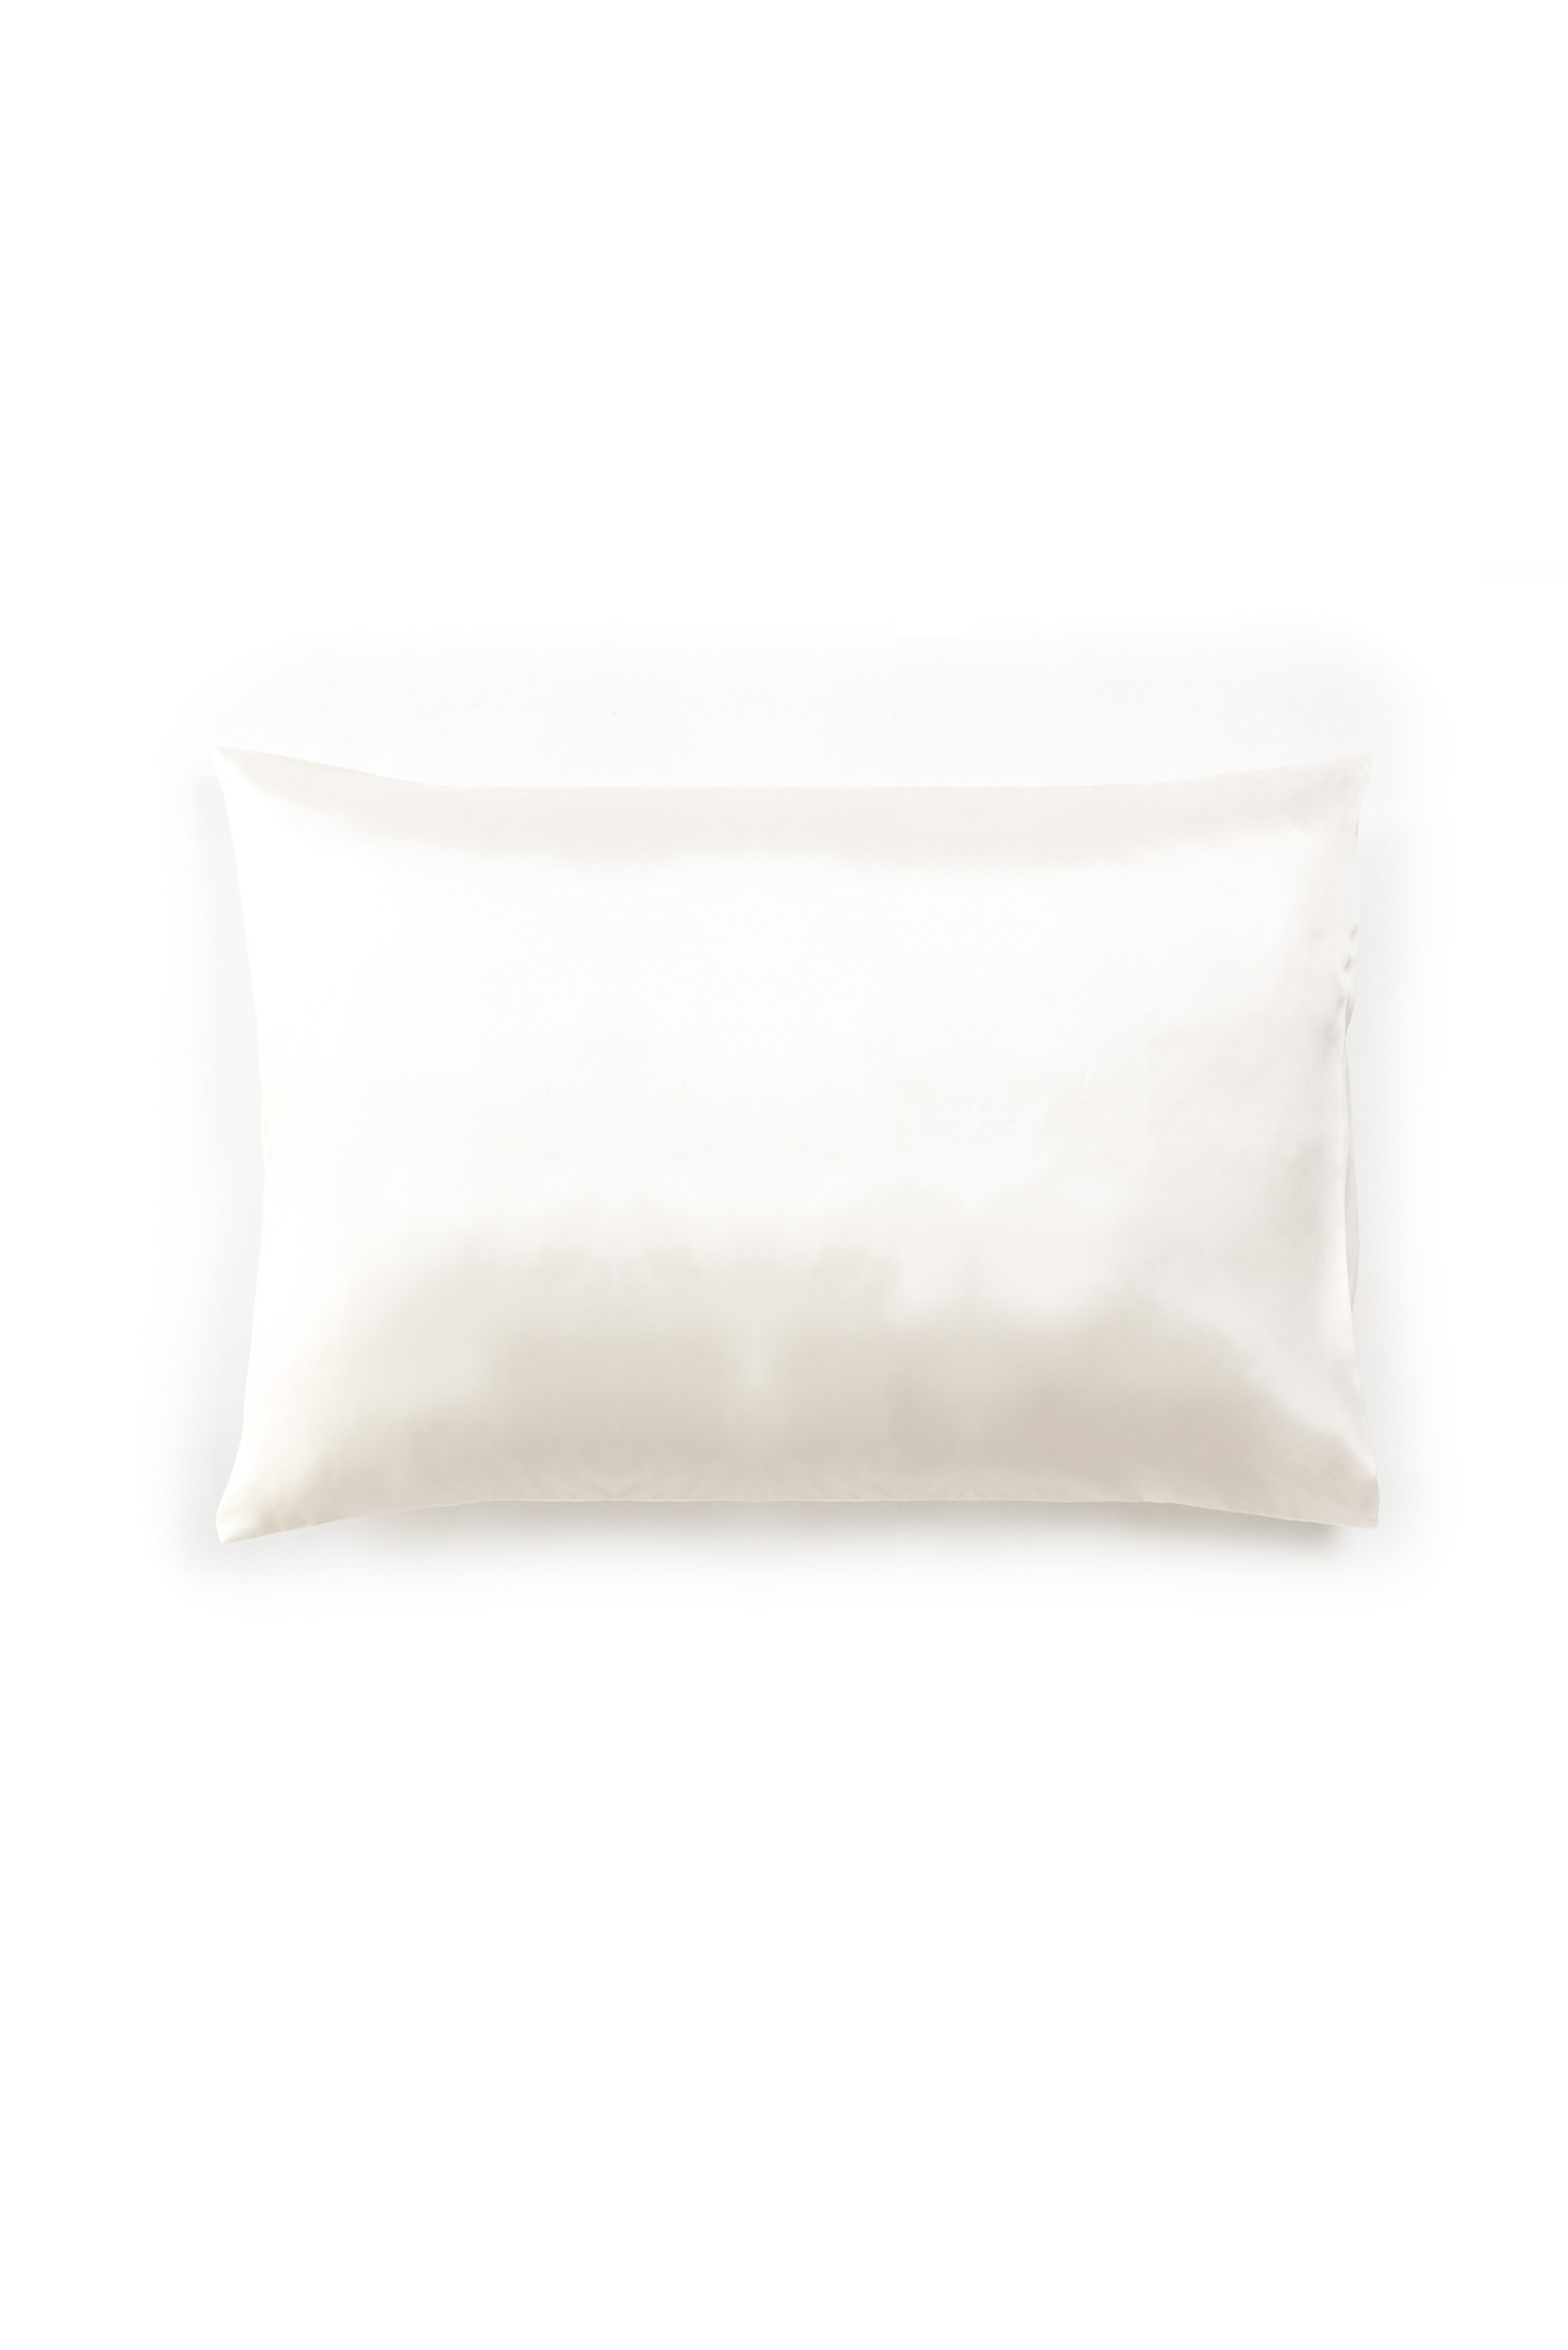 Anti-ageing SIlk Pillowcase with collagen treatment